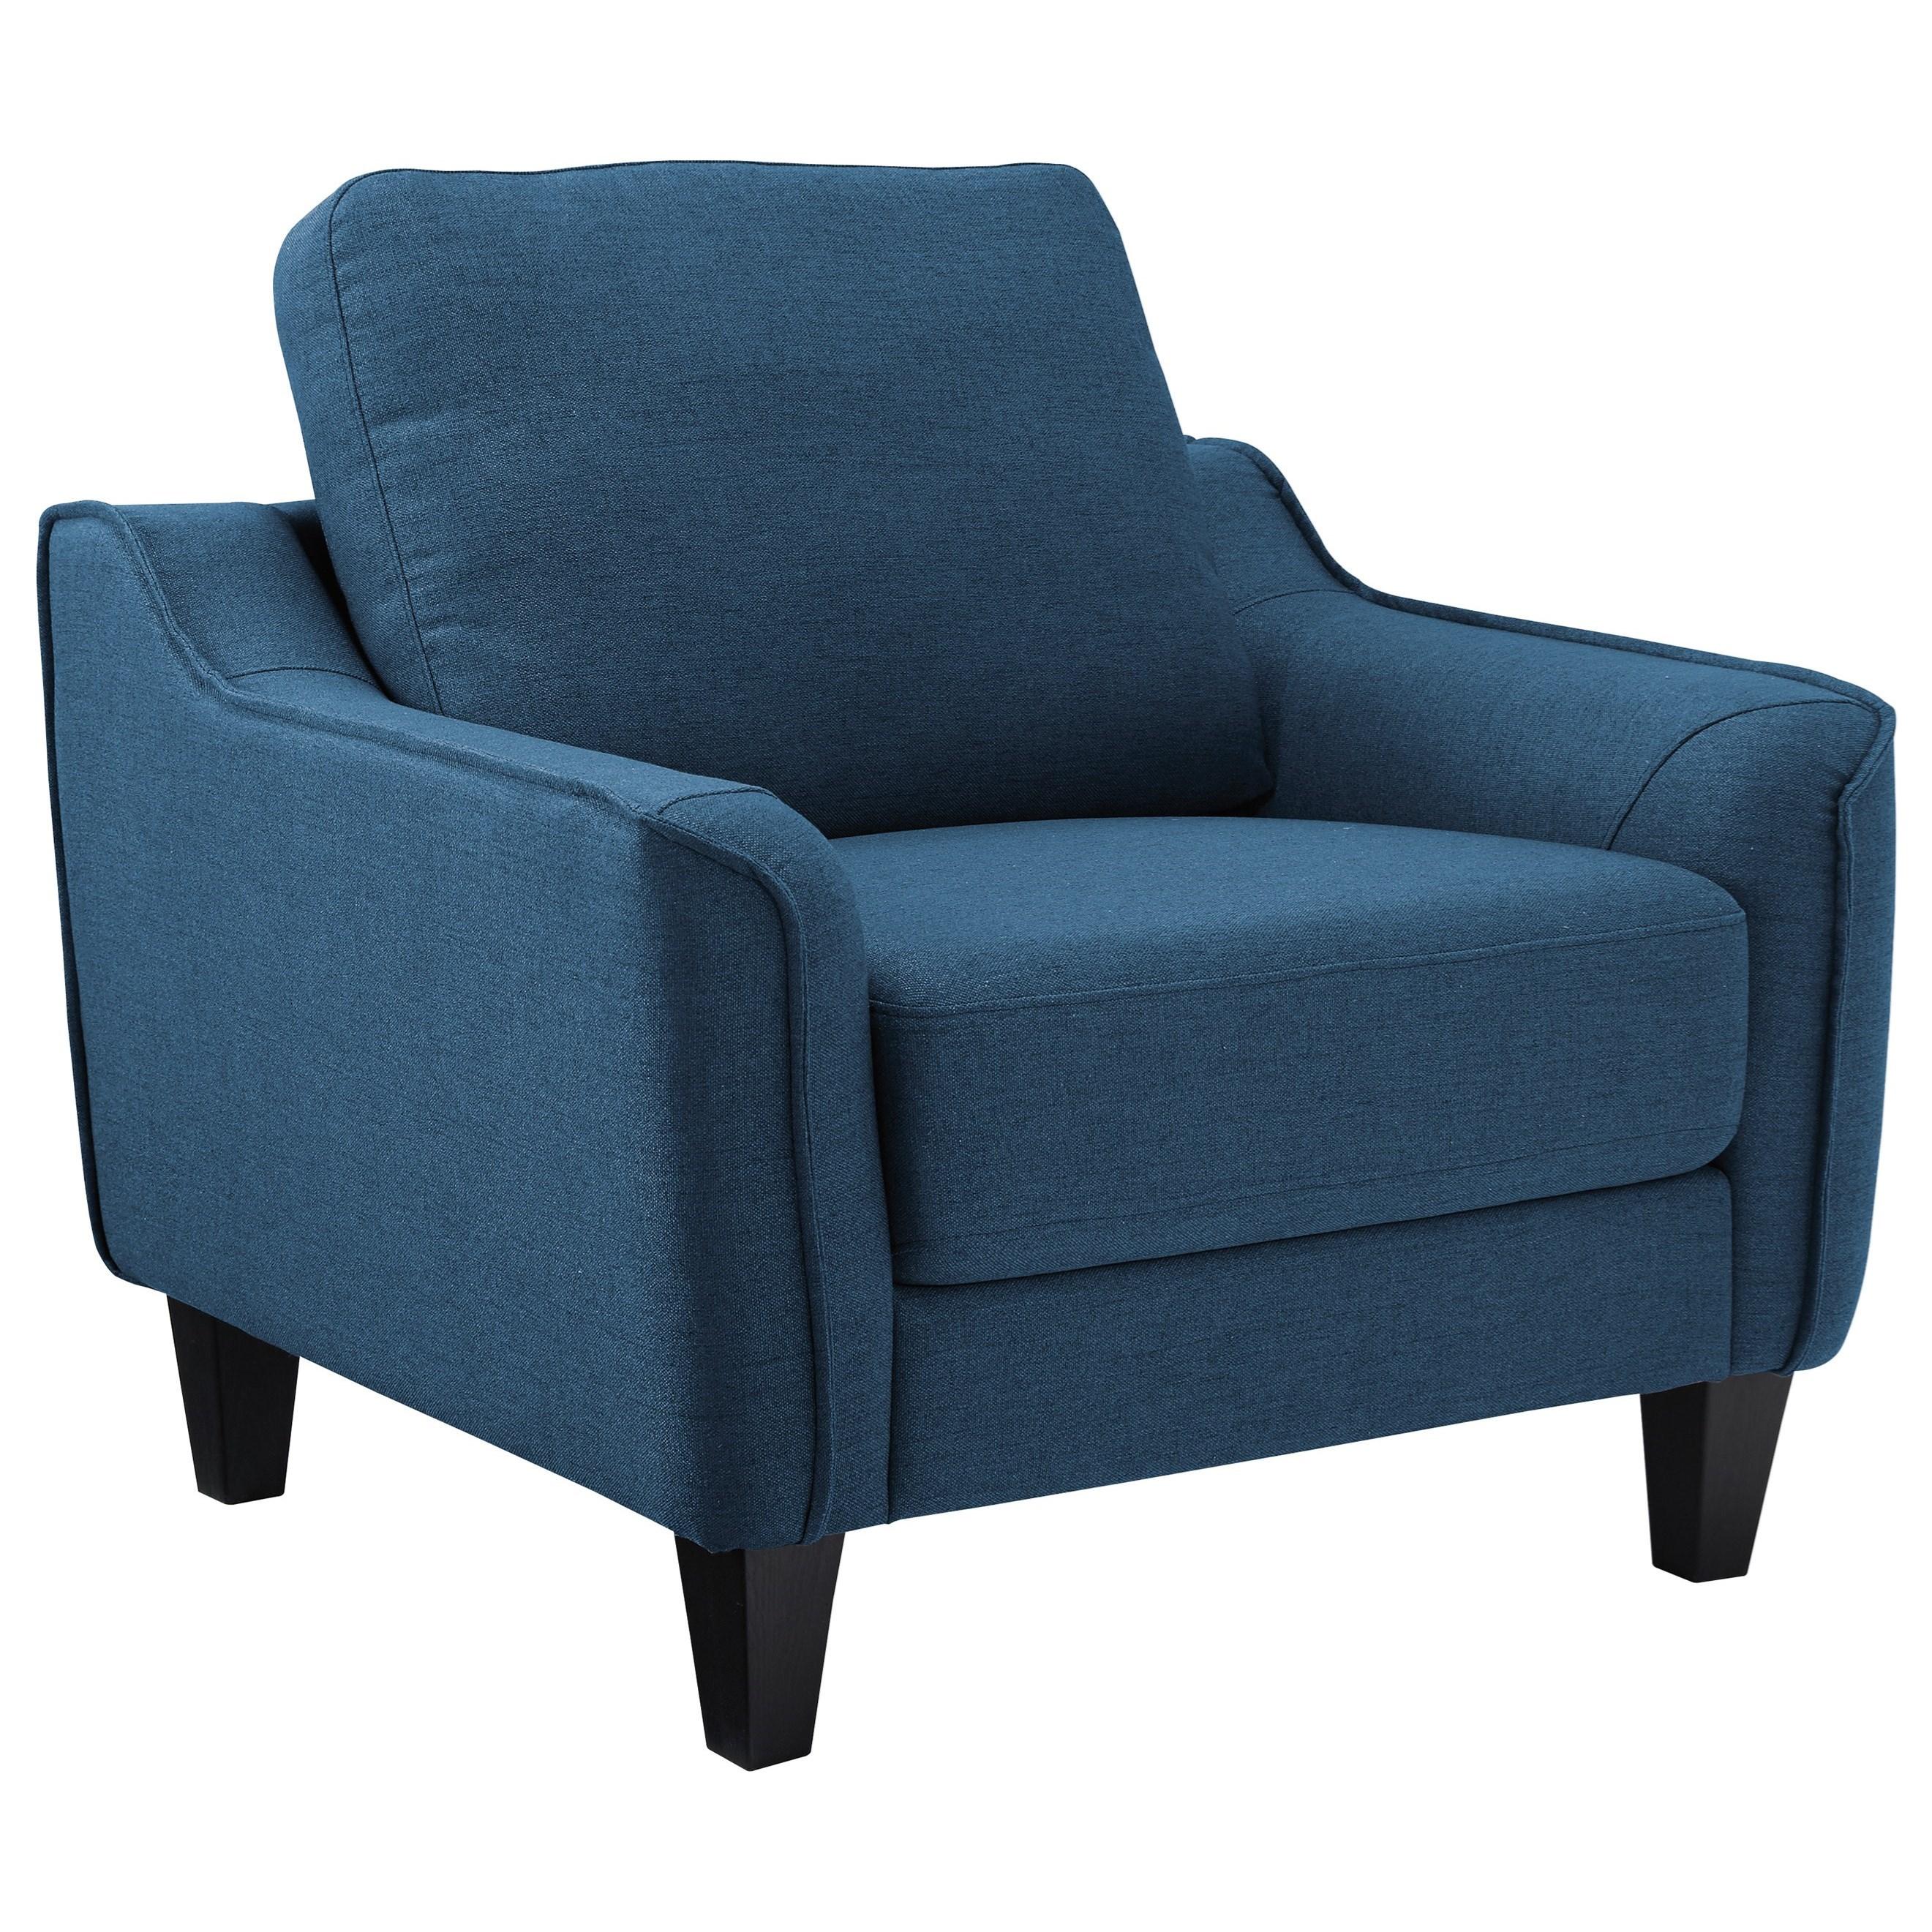 Signature Design by Ashley Jarreau Chair - Item Number: 1150320